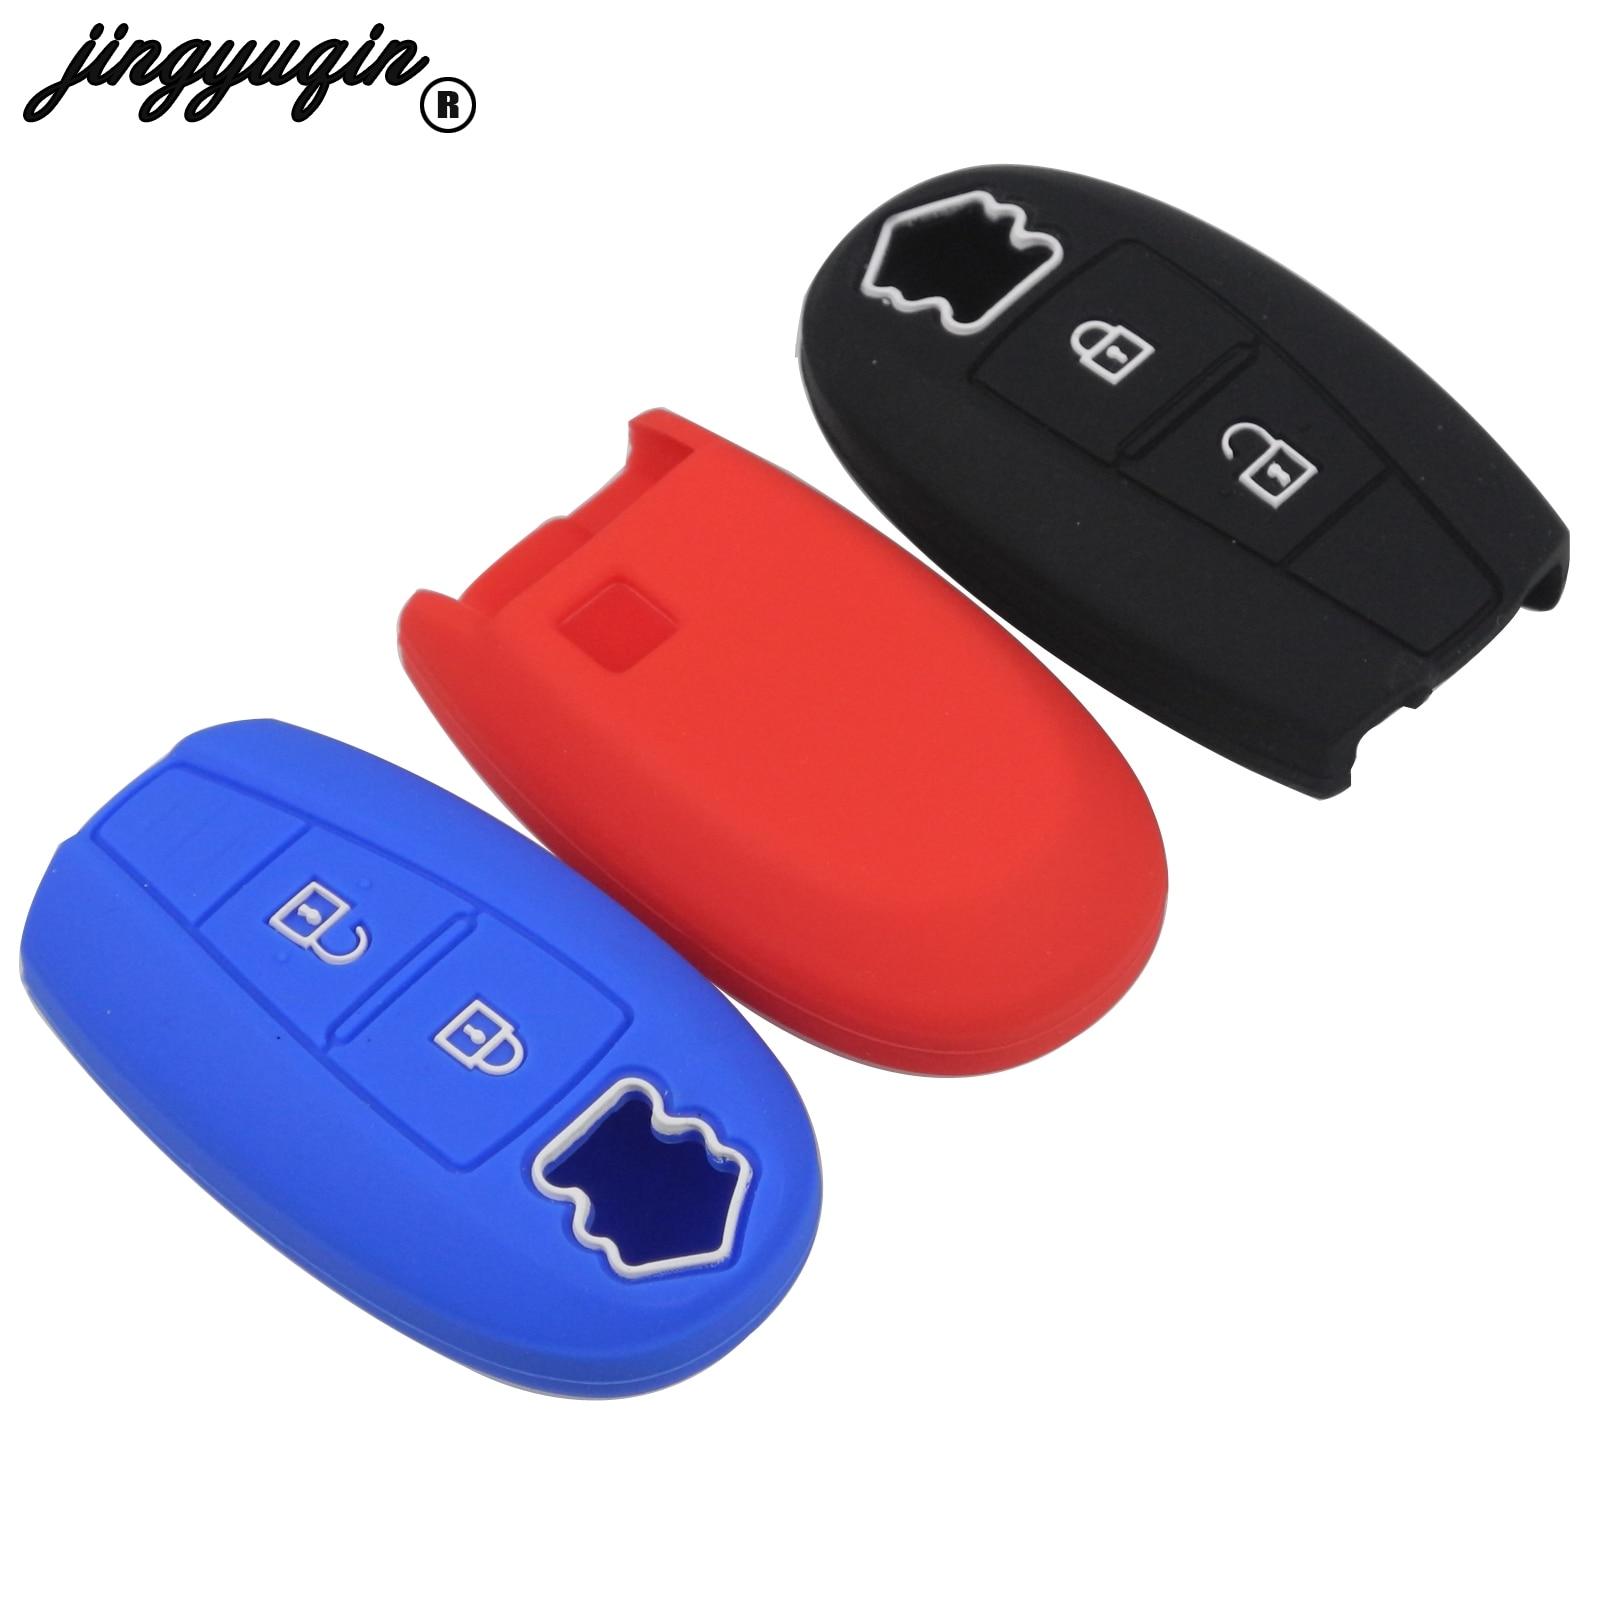 Jingyuqin Silikon Abdeckung Smart Key Fall Für Suzuki Swift Kizashi SX4 S-Kreuz 2 Tasten Auto Keyless Fob Set haut Halter Schutz